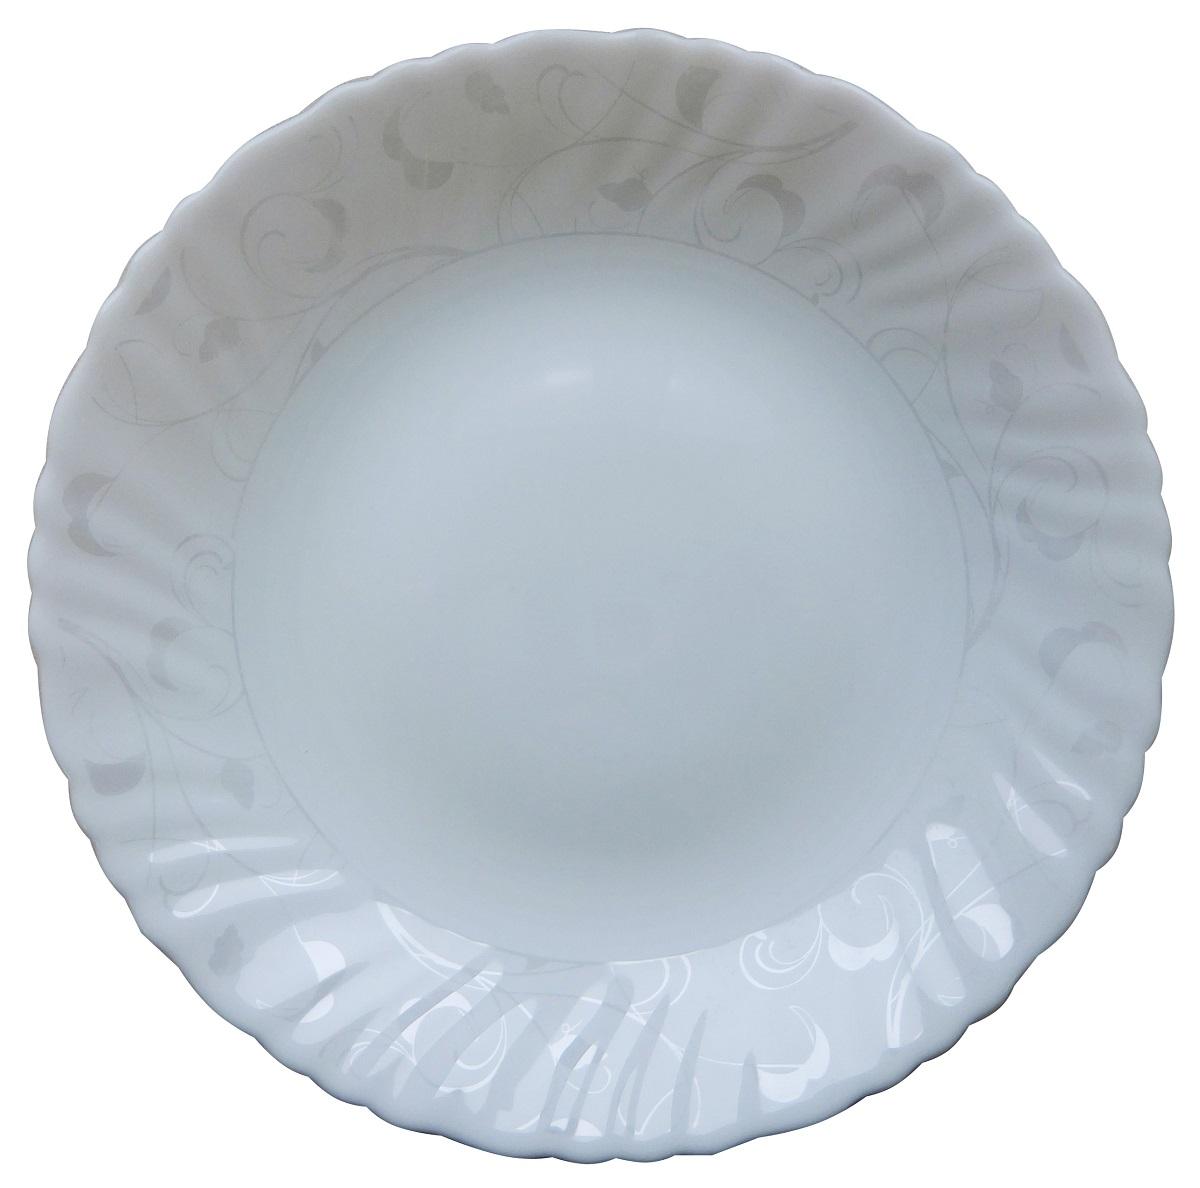 Тарелка обеденная Chinbull Иль-де-Франс. Волна, диаметр 24 см цена